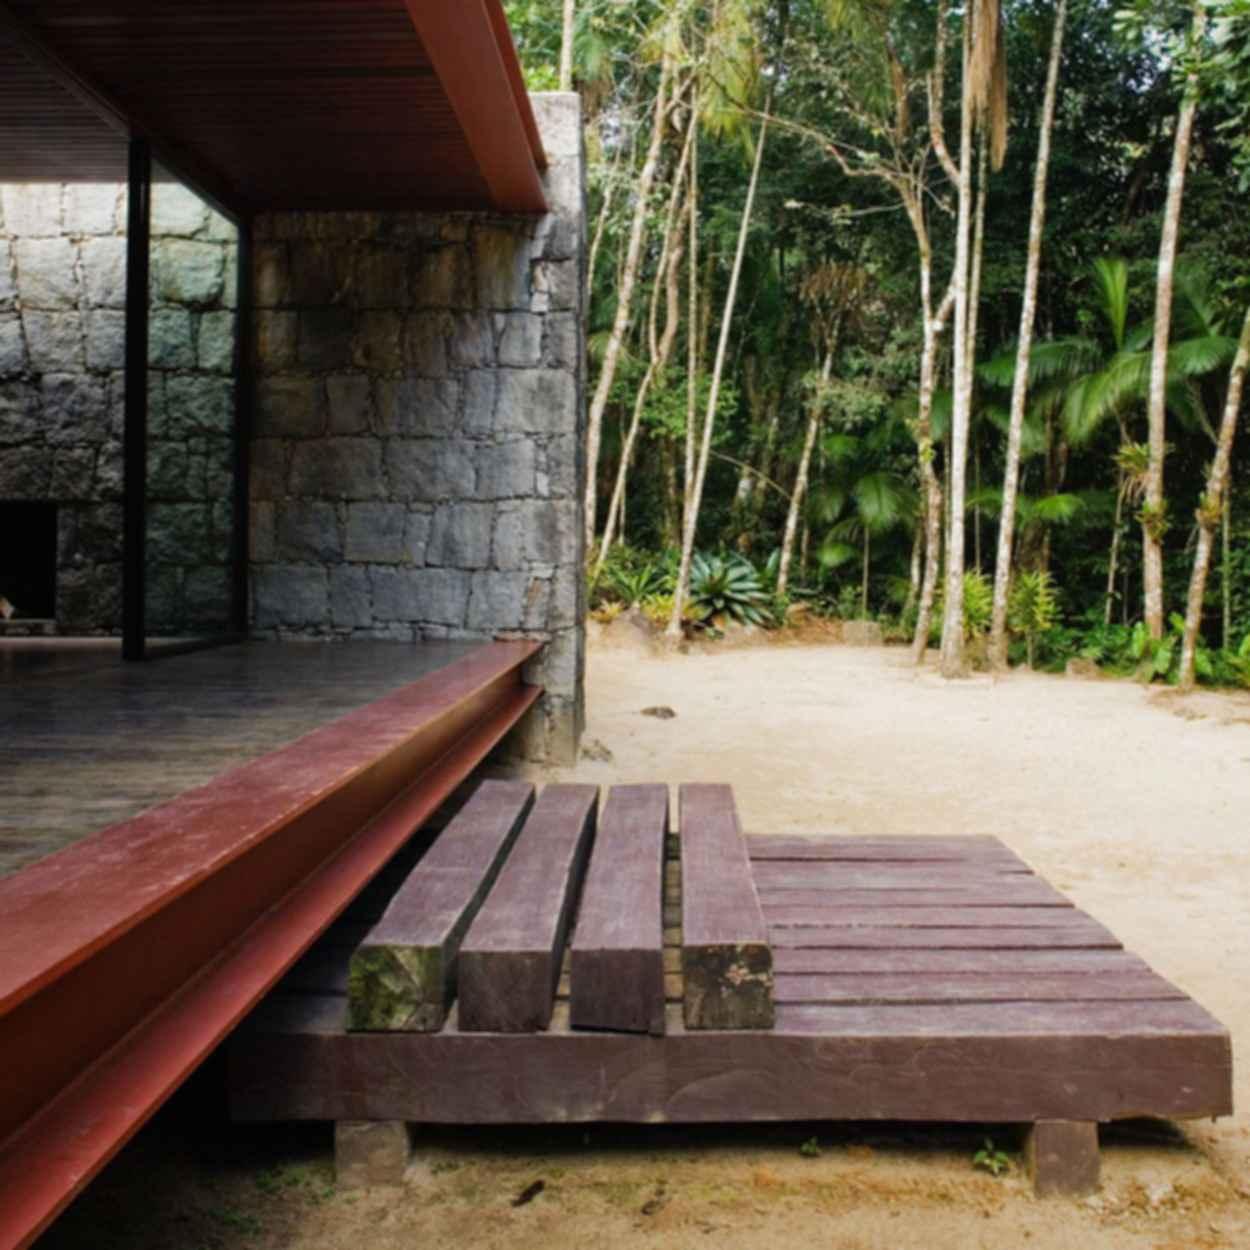 Rio Bonito - Exterior/Stairs